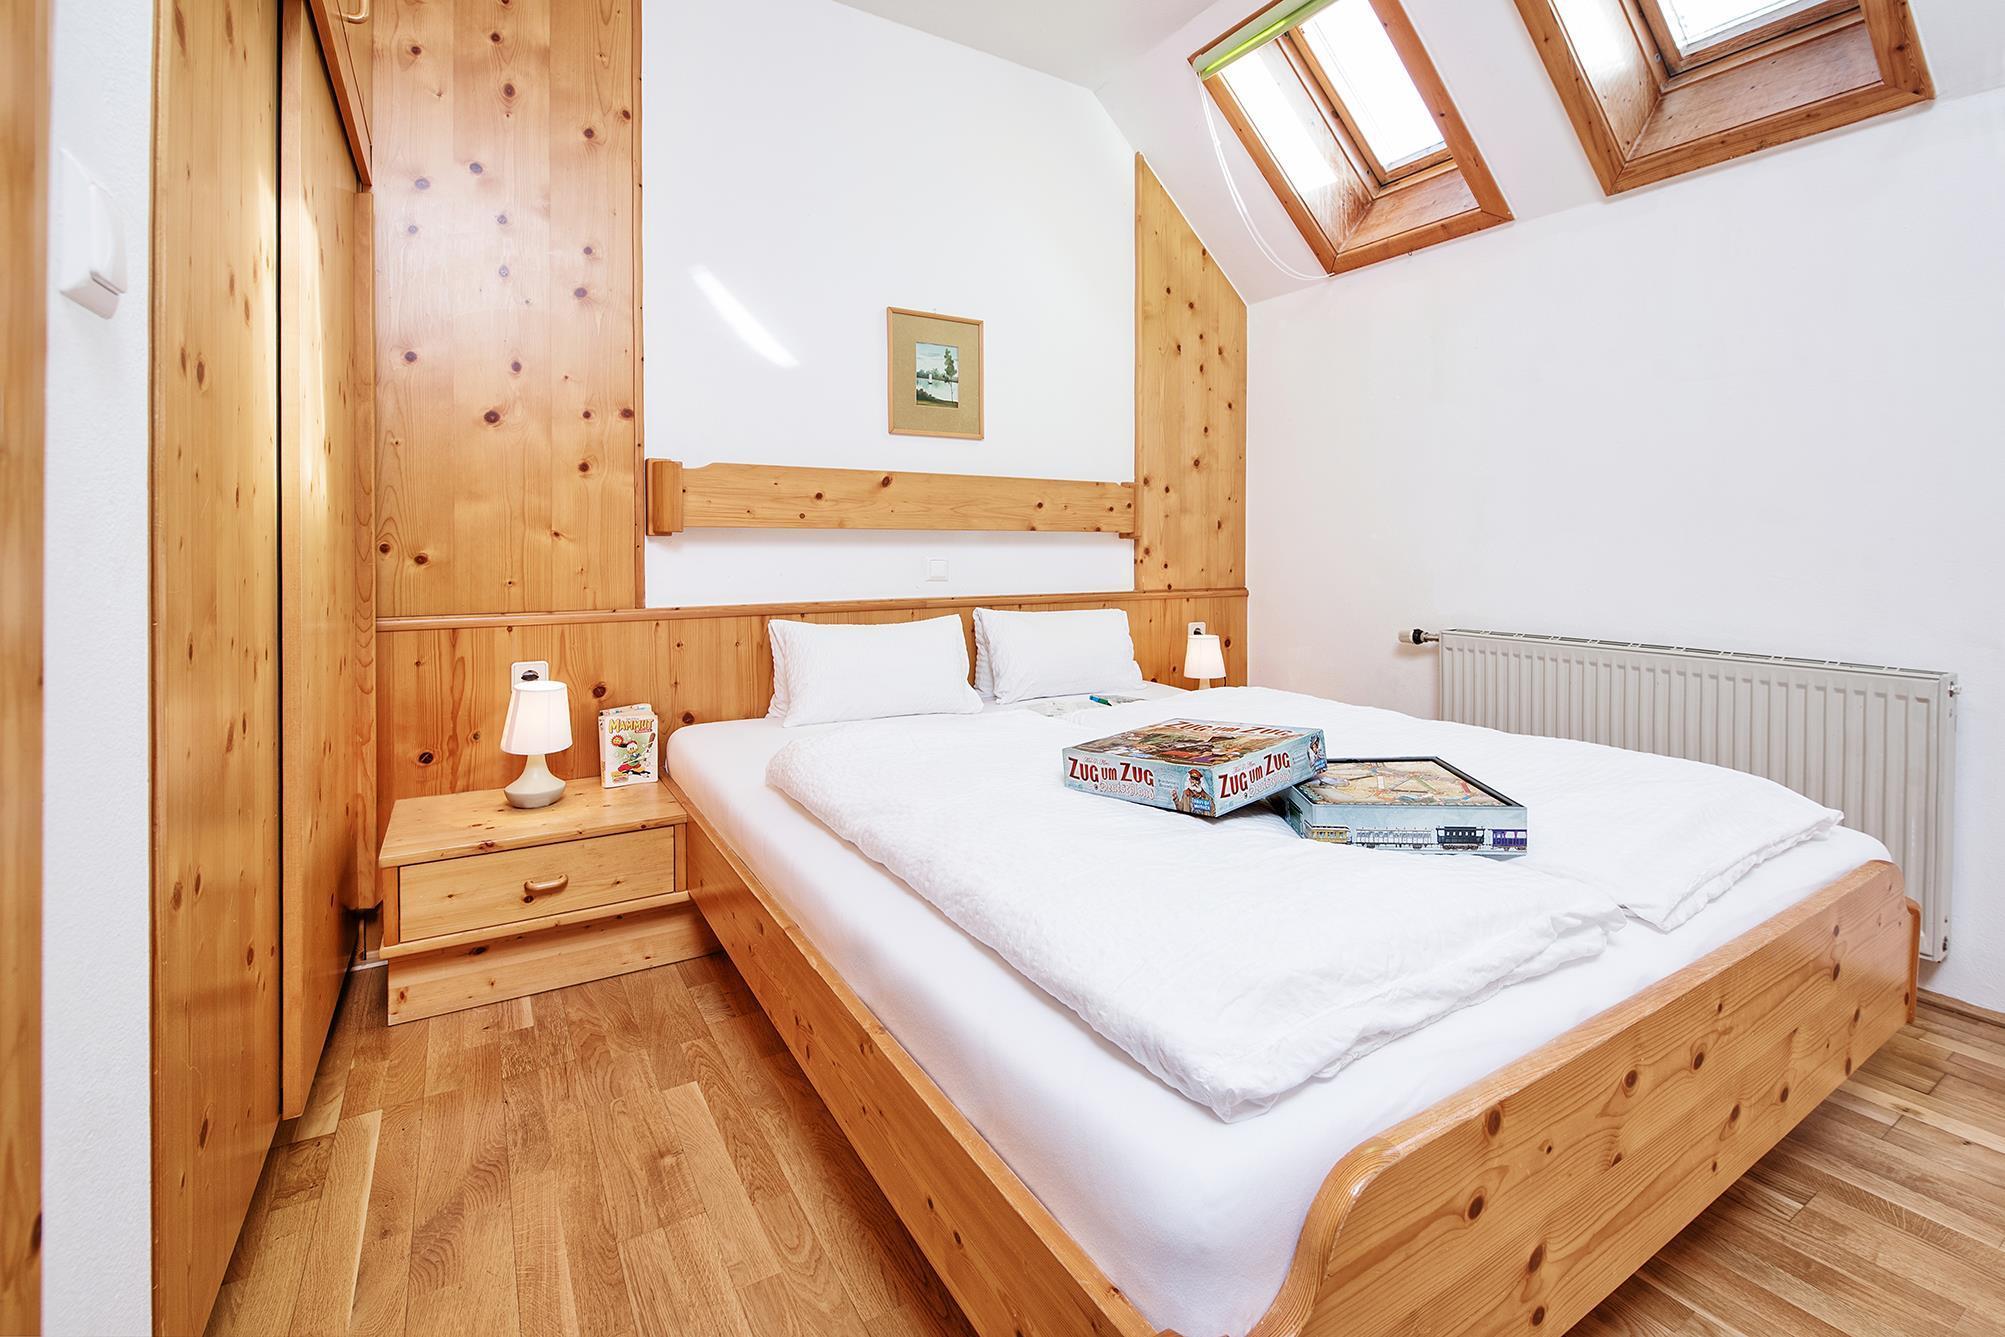 Appartement de vacances Landhaus Parth Ferienwohnung 70 m² bis7 Personen (2372192), Ossiach, Lac Ossiach, Carinthie, Autriche, image 76